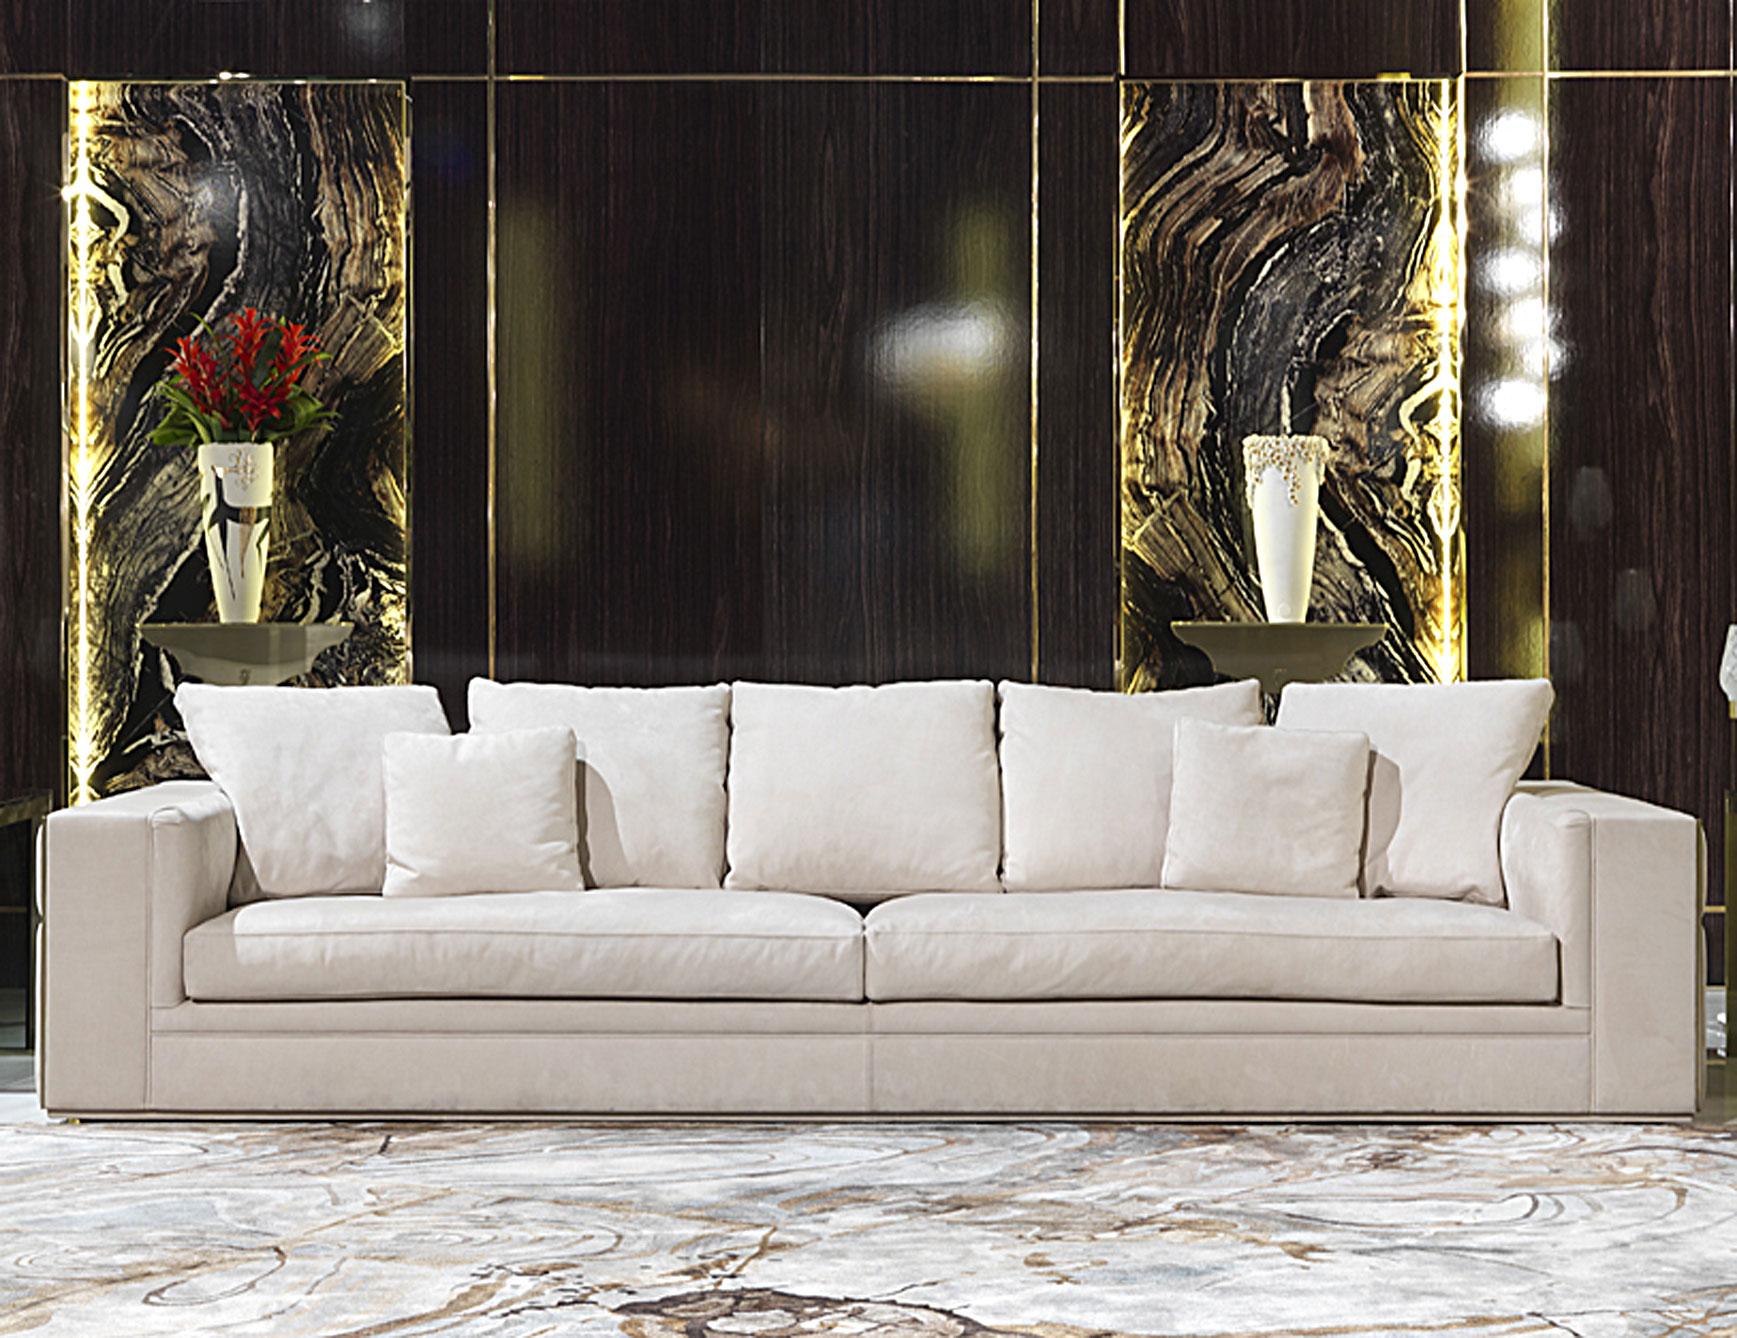 nella vetrina visionnaire ipe cavalli babylon luxury italian sofa UFKZFEV